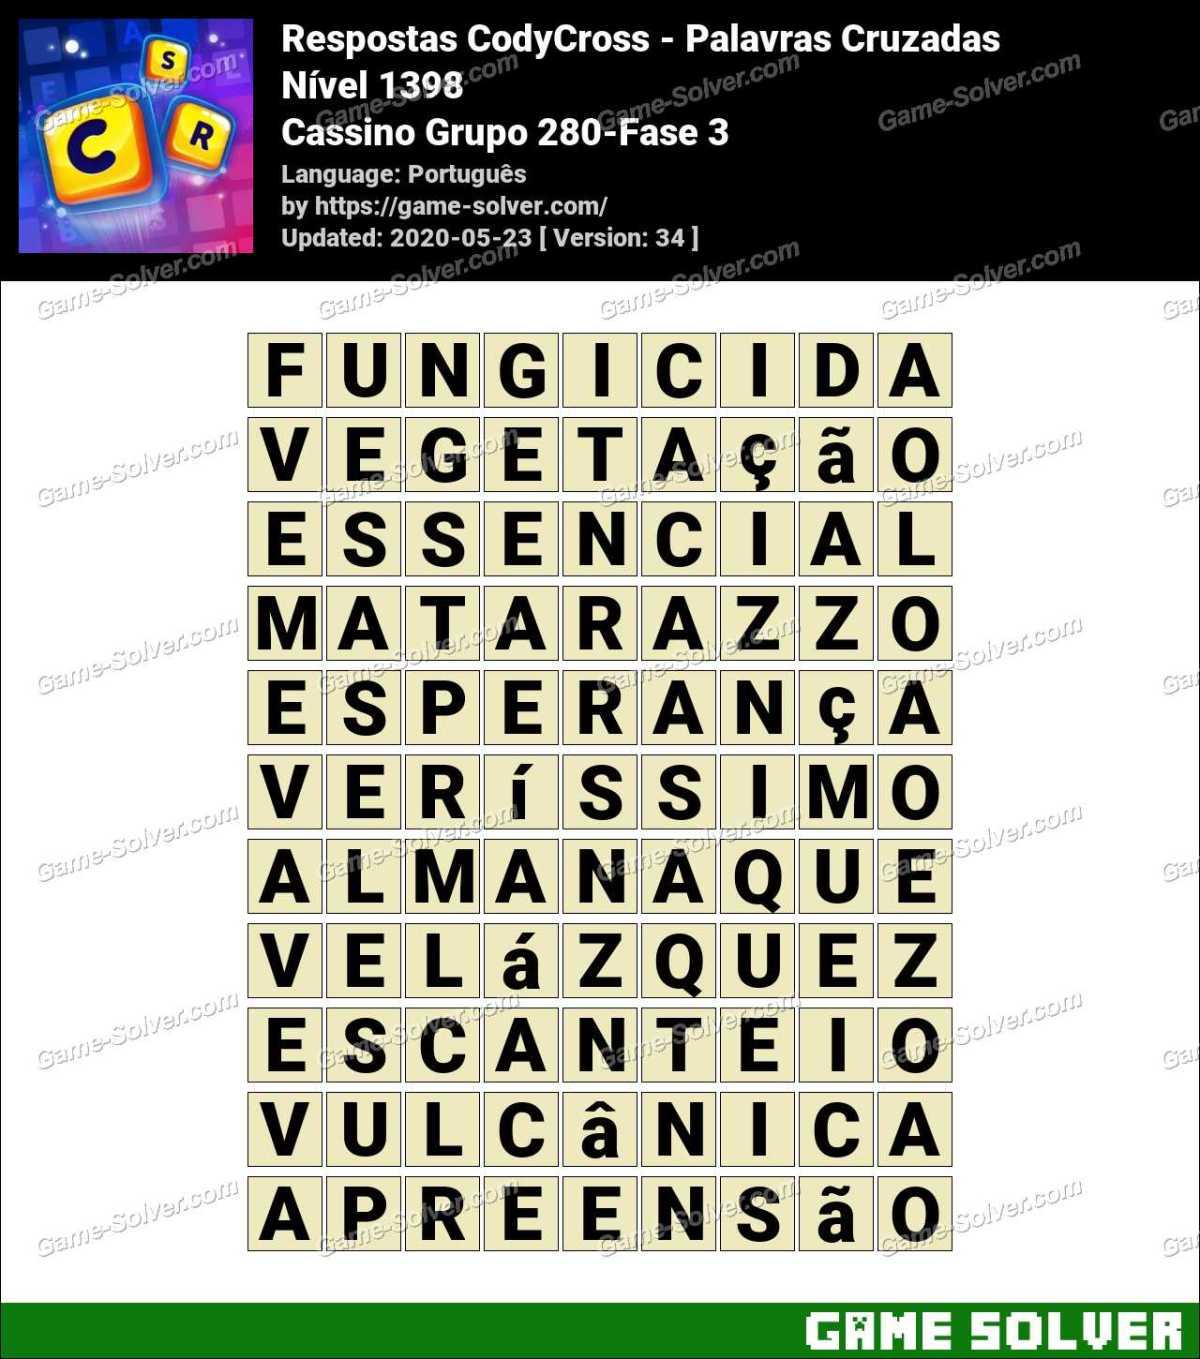 Respostas CodyCross Cassino Grupo 280-Fase 3